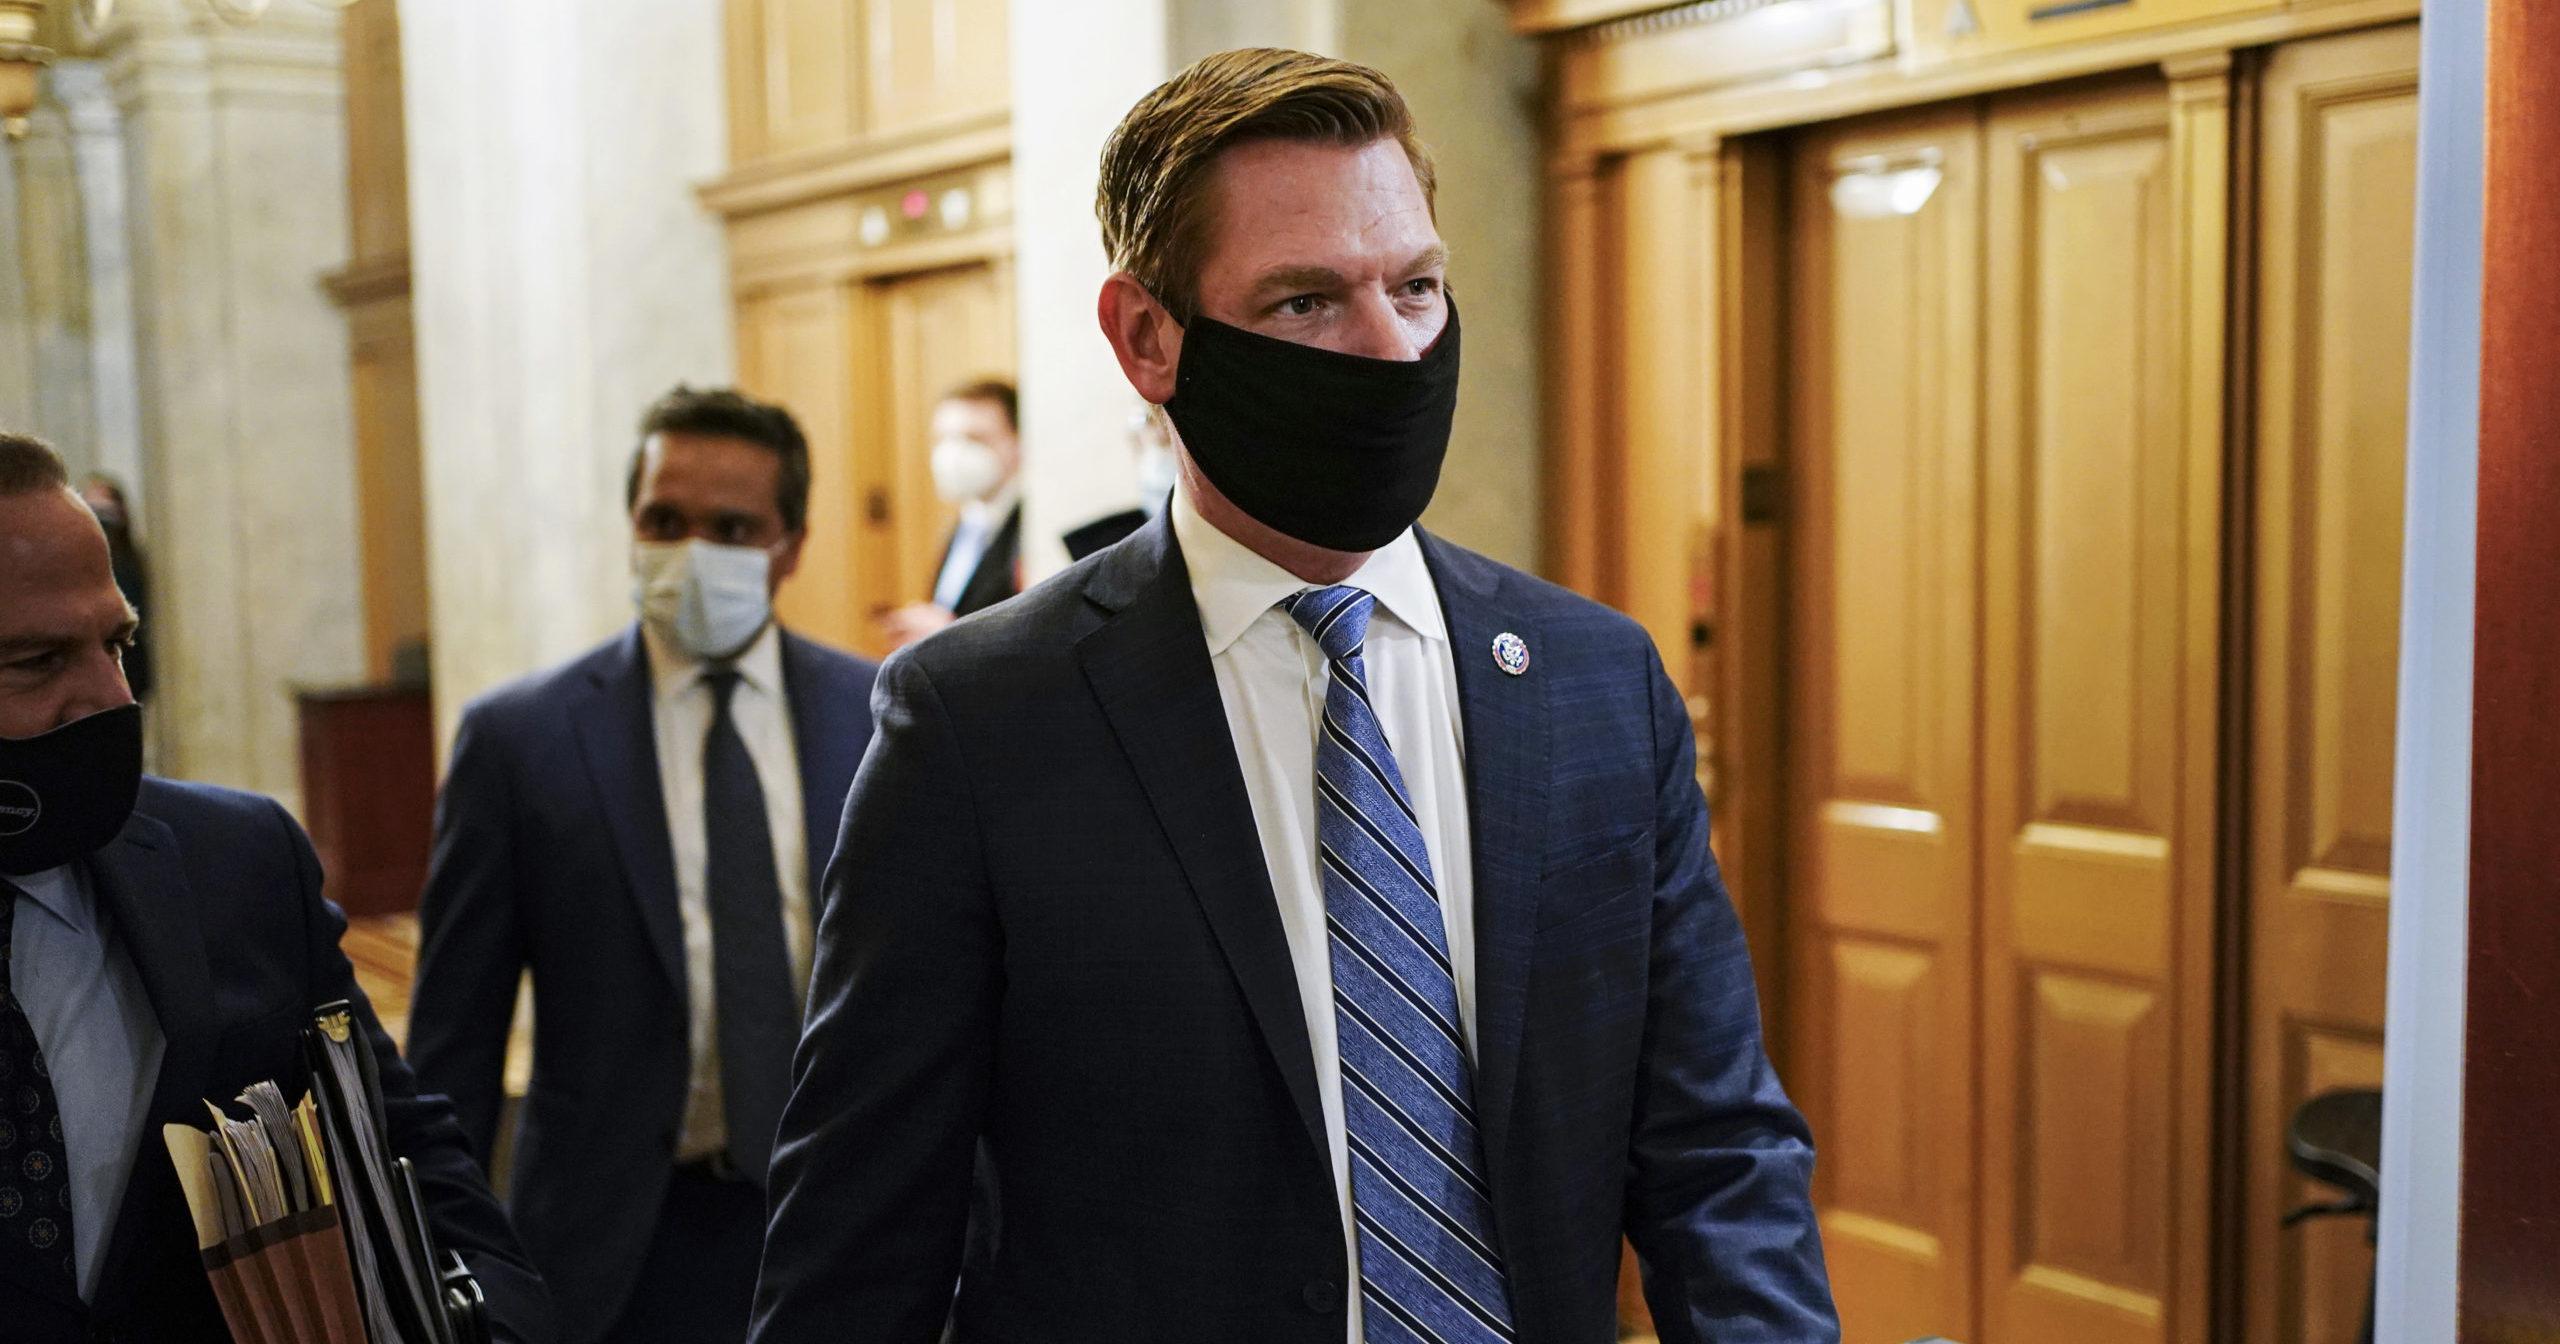 Democratic Rep. Eric Swalwell walks through the Capitol in Washington, D.C., on Feb. 10, 2021.